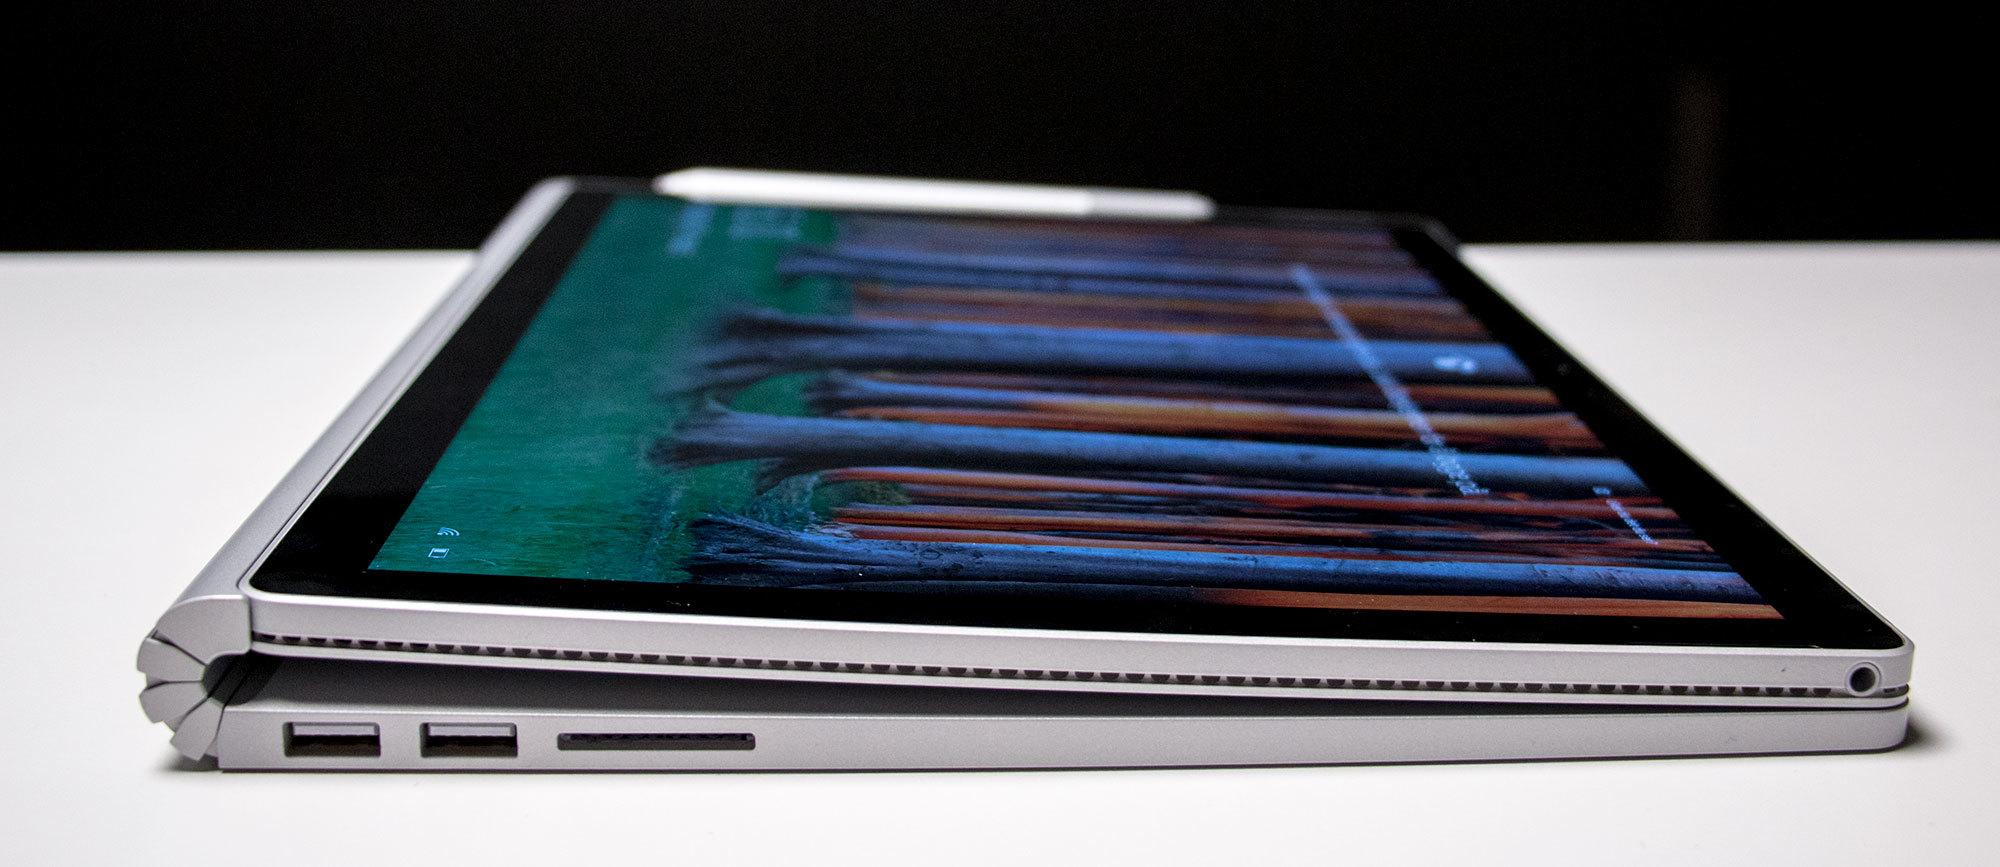 Når Surface Book hvilker slik er den vinklet for bedre komfort når du tegner eller skriver med pennen.